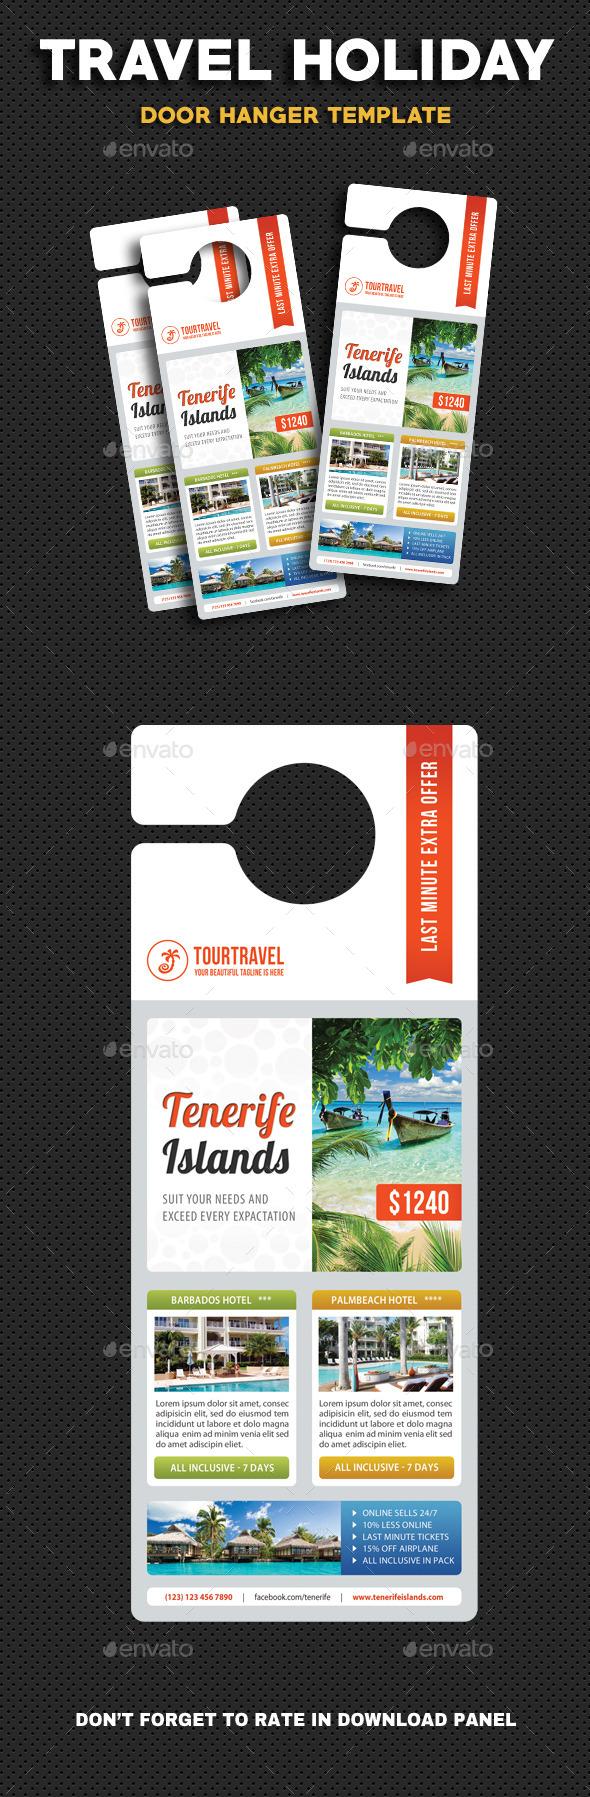 Travel Holiday Door Hanger V3 - Miscellaneous Print Templates